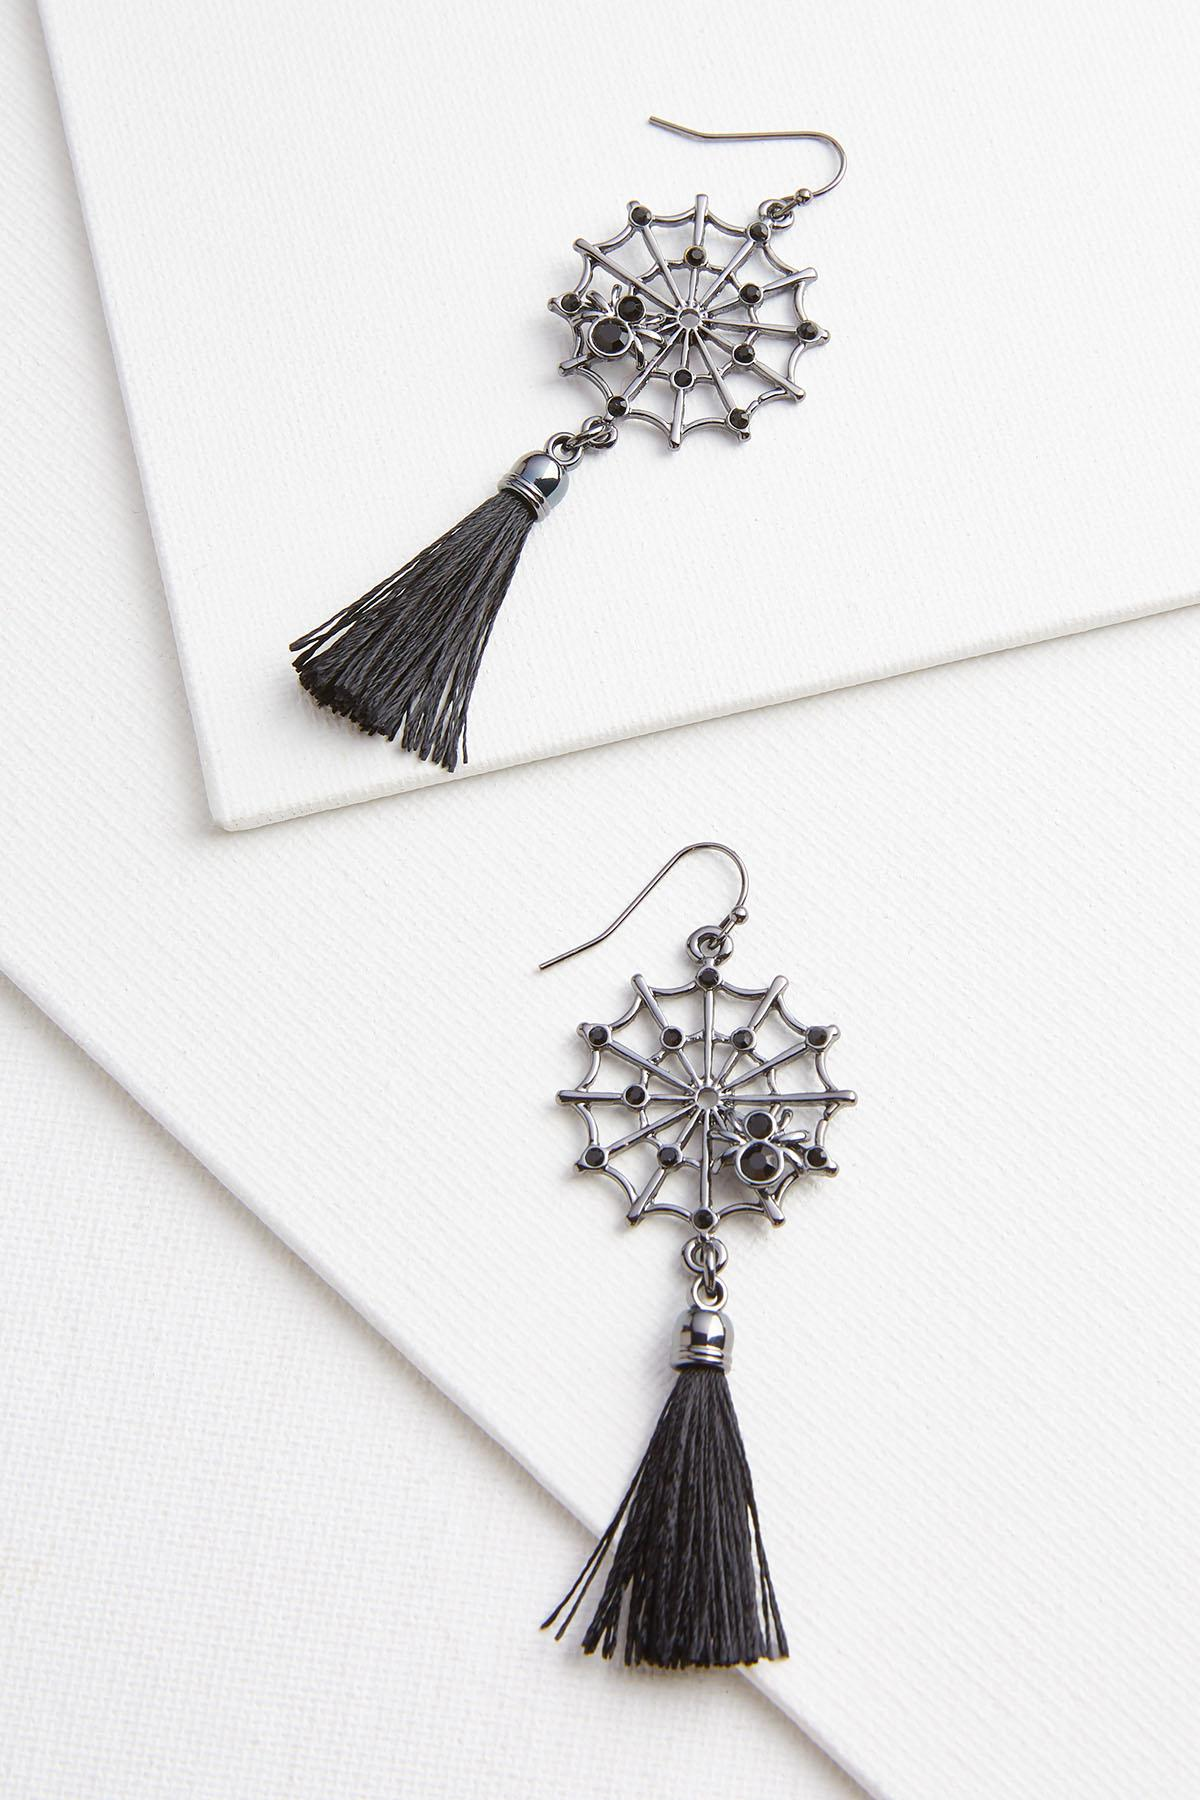 Web Of Lies Earrings